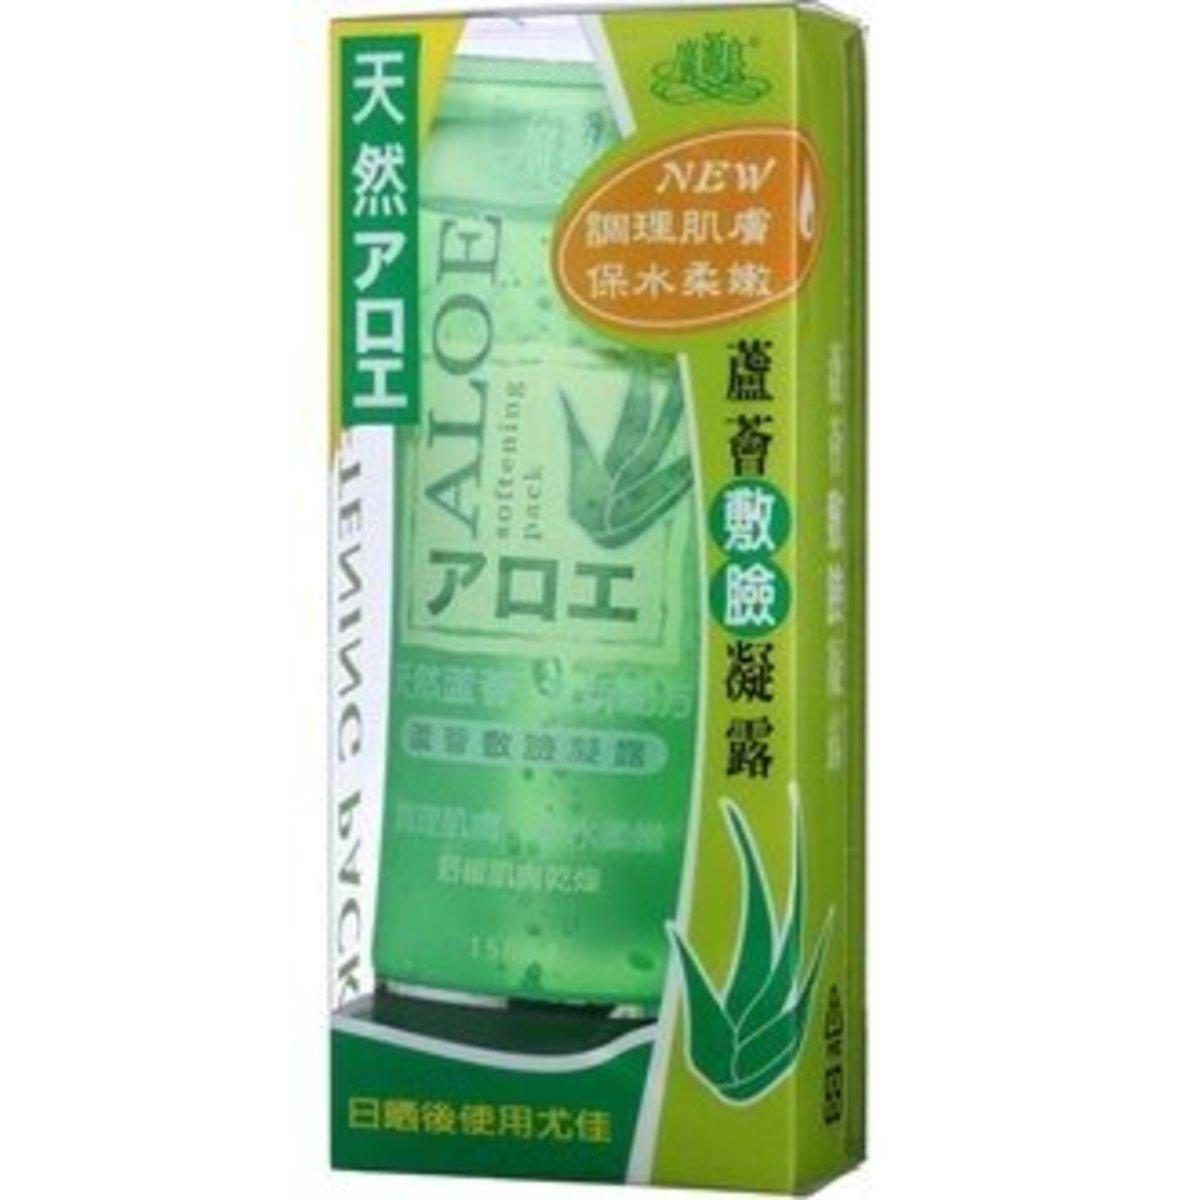 Aloe Vera Mask 150ml